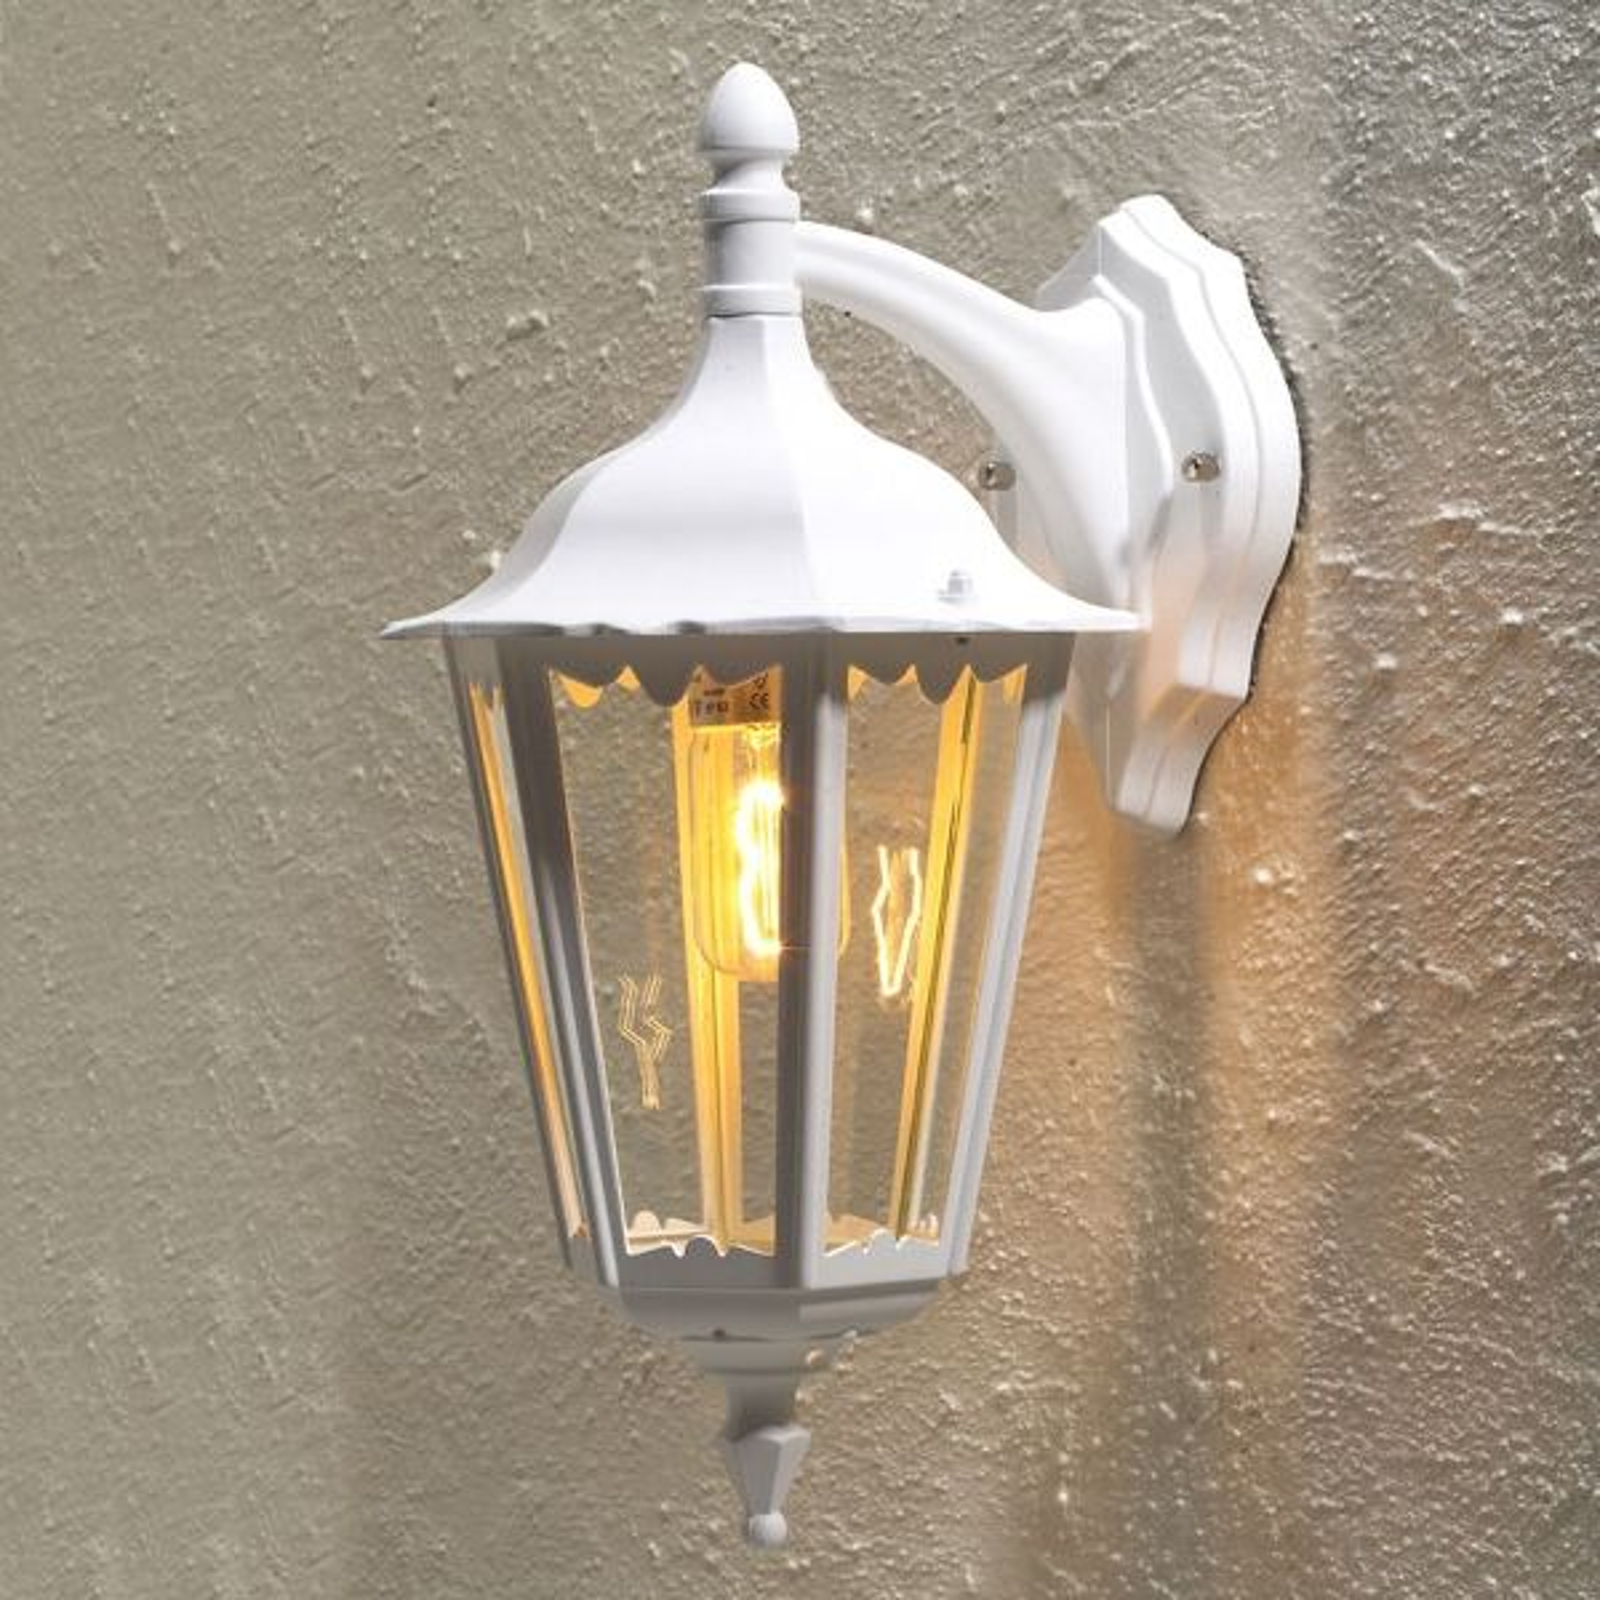 Buitenwandlamp Firenze, hangend, 48cm, wit